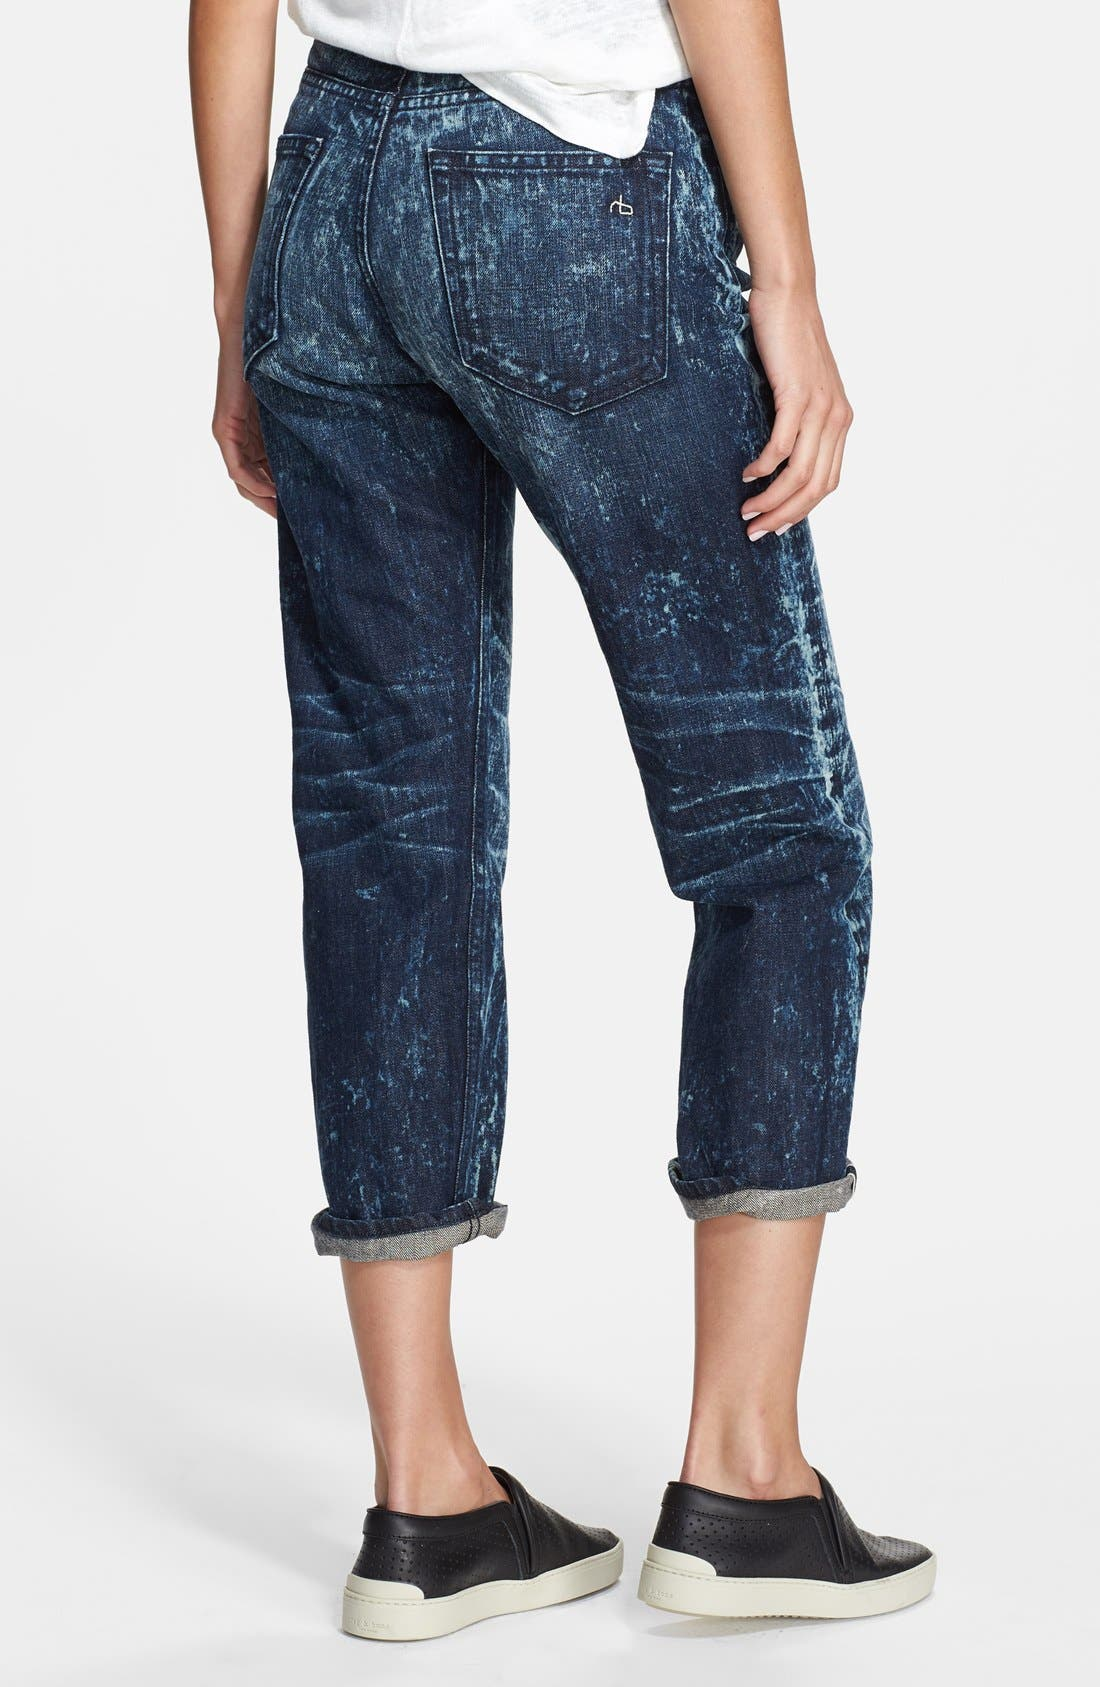 JEAN 'Marilyn' Crop Jeans,                             Alternate thumbnail 2, color,                             400